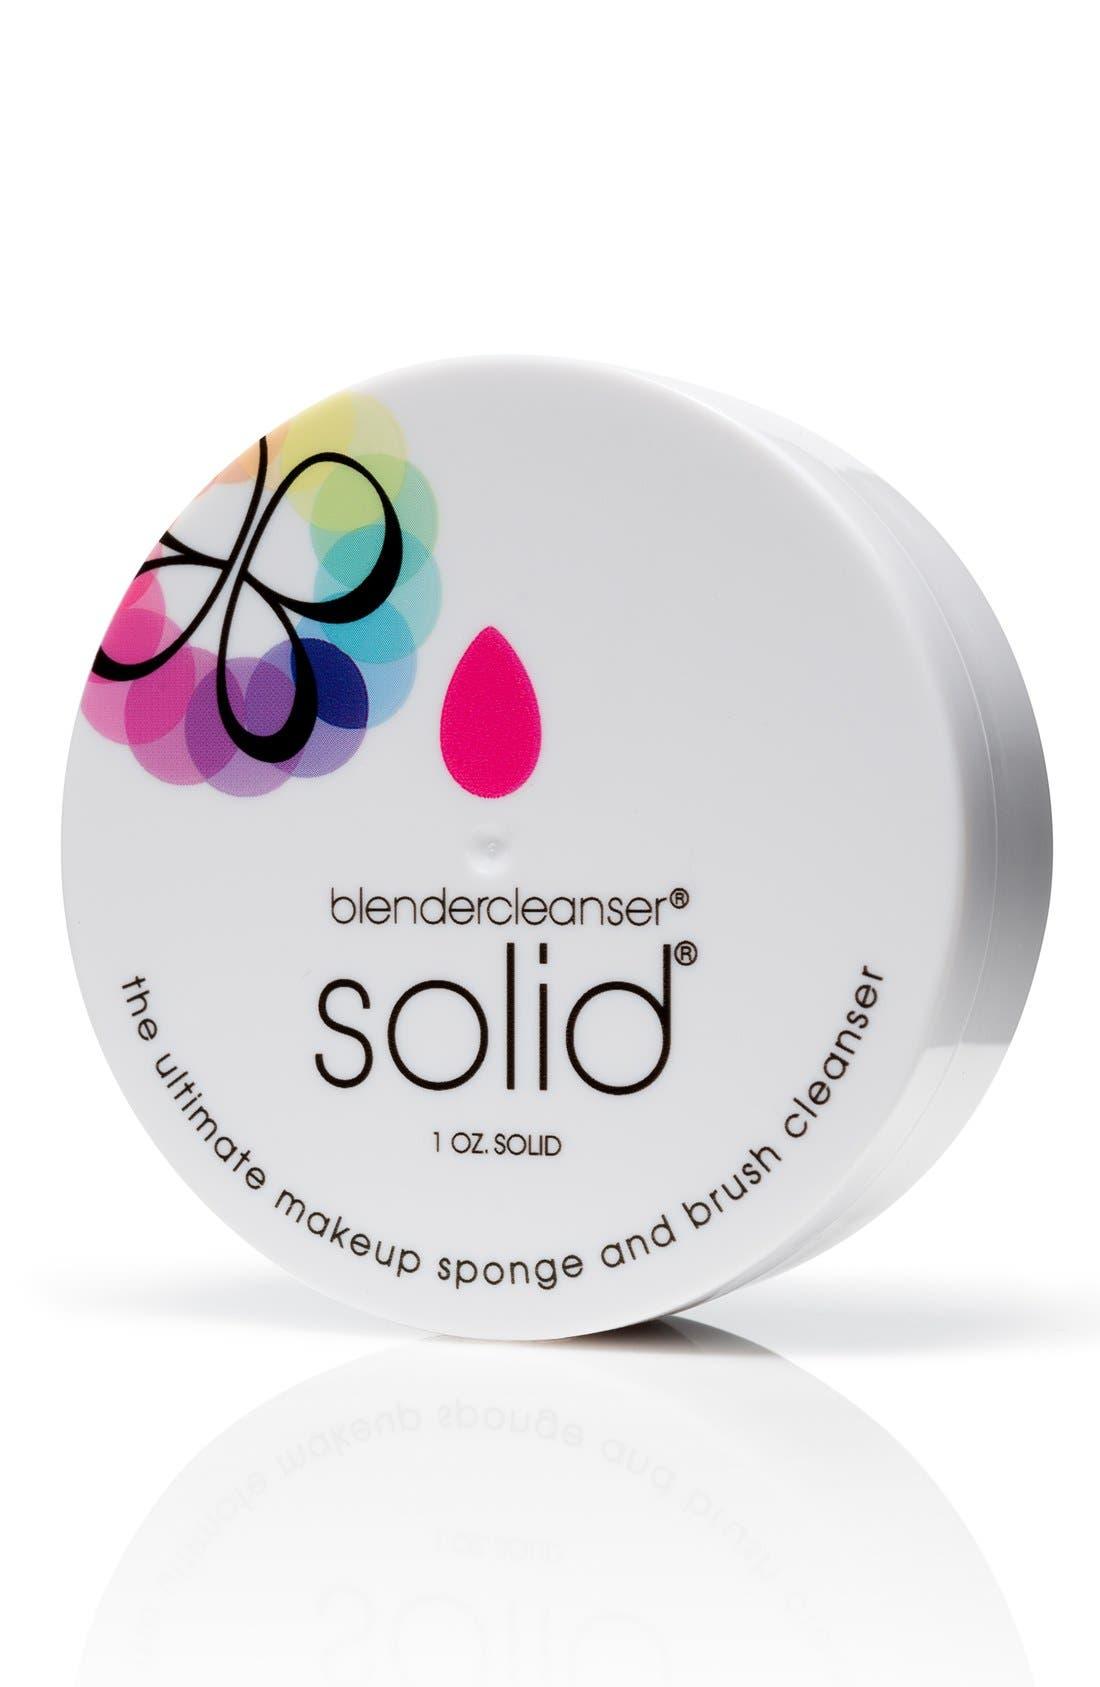 'blendercleanser<sup>®</sup> Solid<sup>™</sup>' Makeup Sponge Cleanser, Main, color, NO COLOR